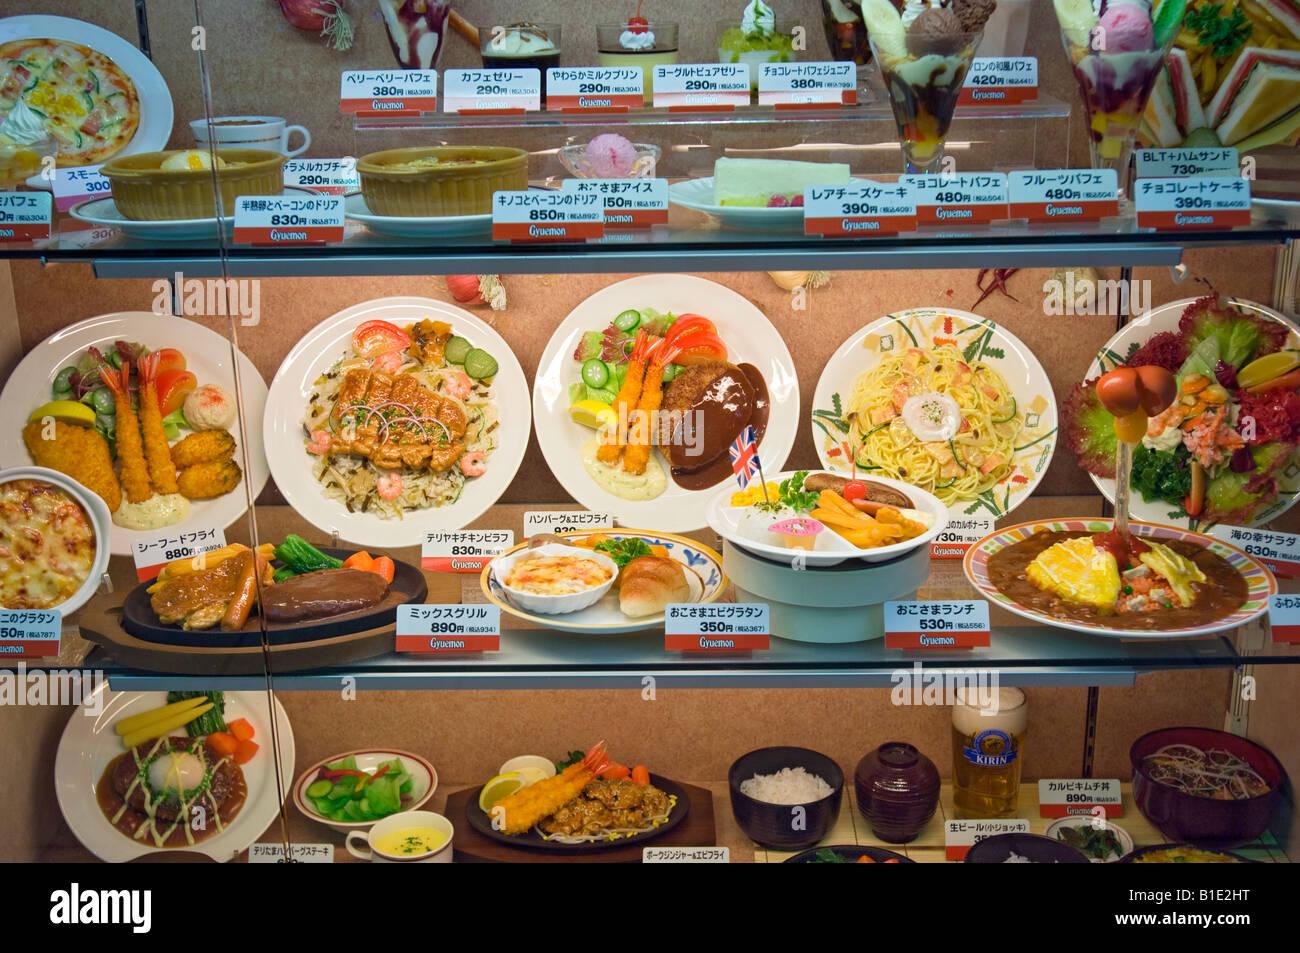 fake food menu stock photos fake food menu stock images alamy